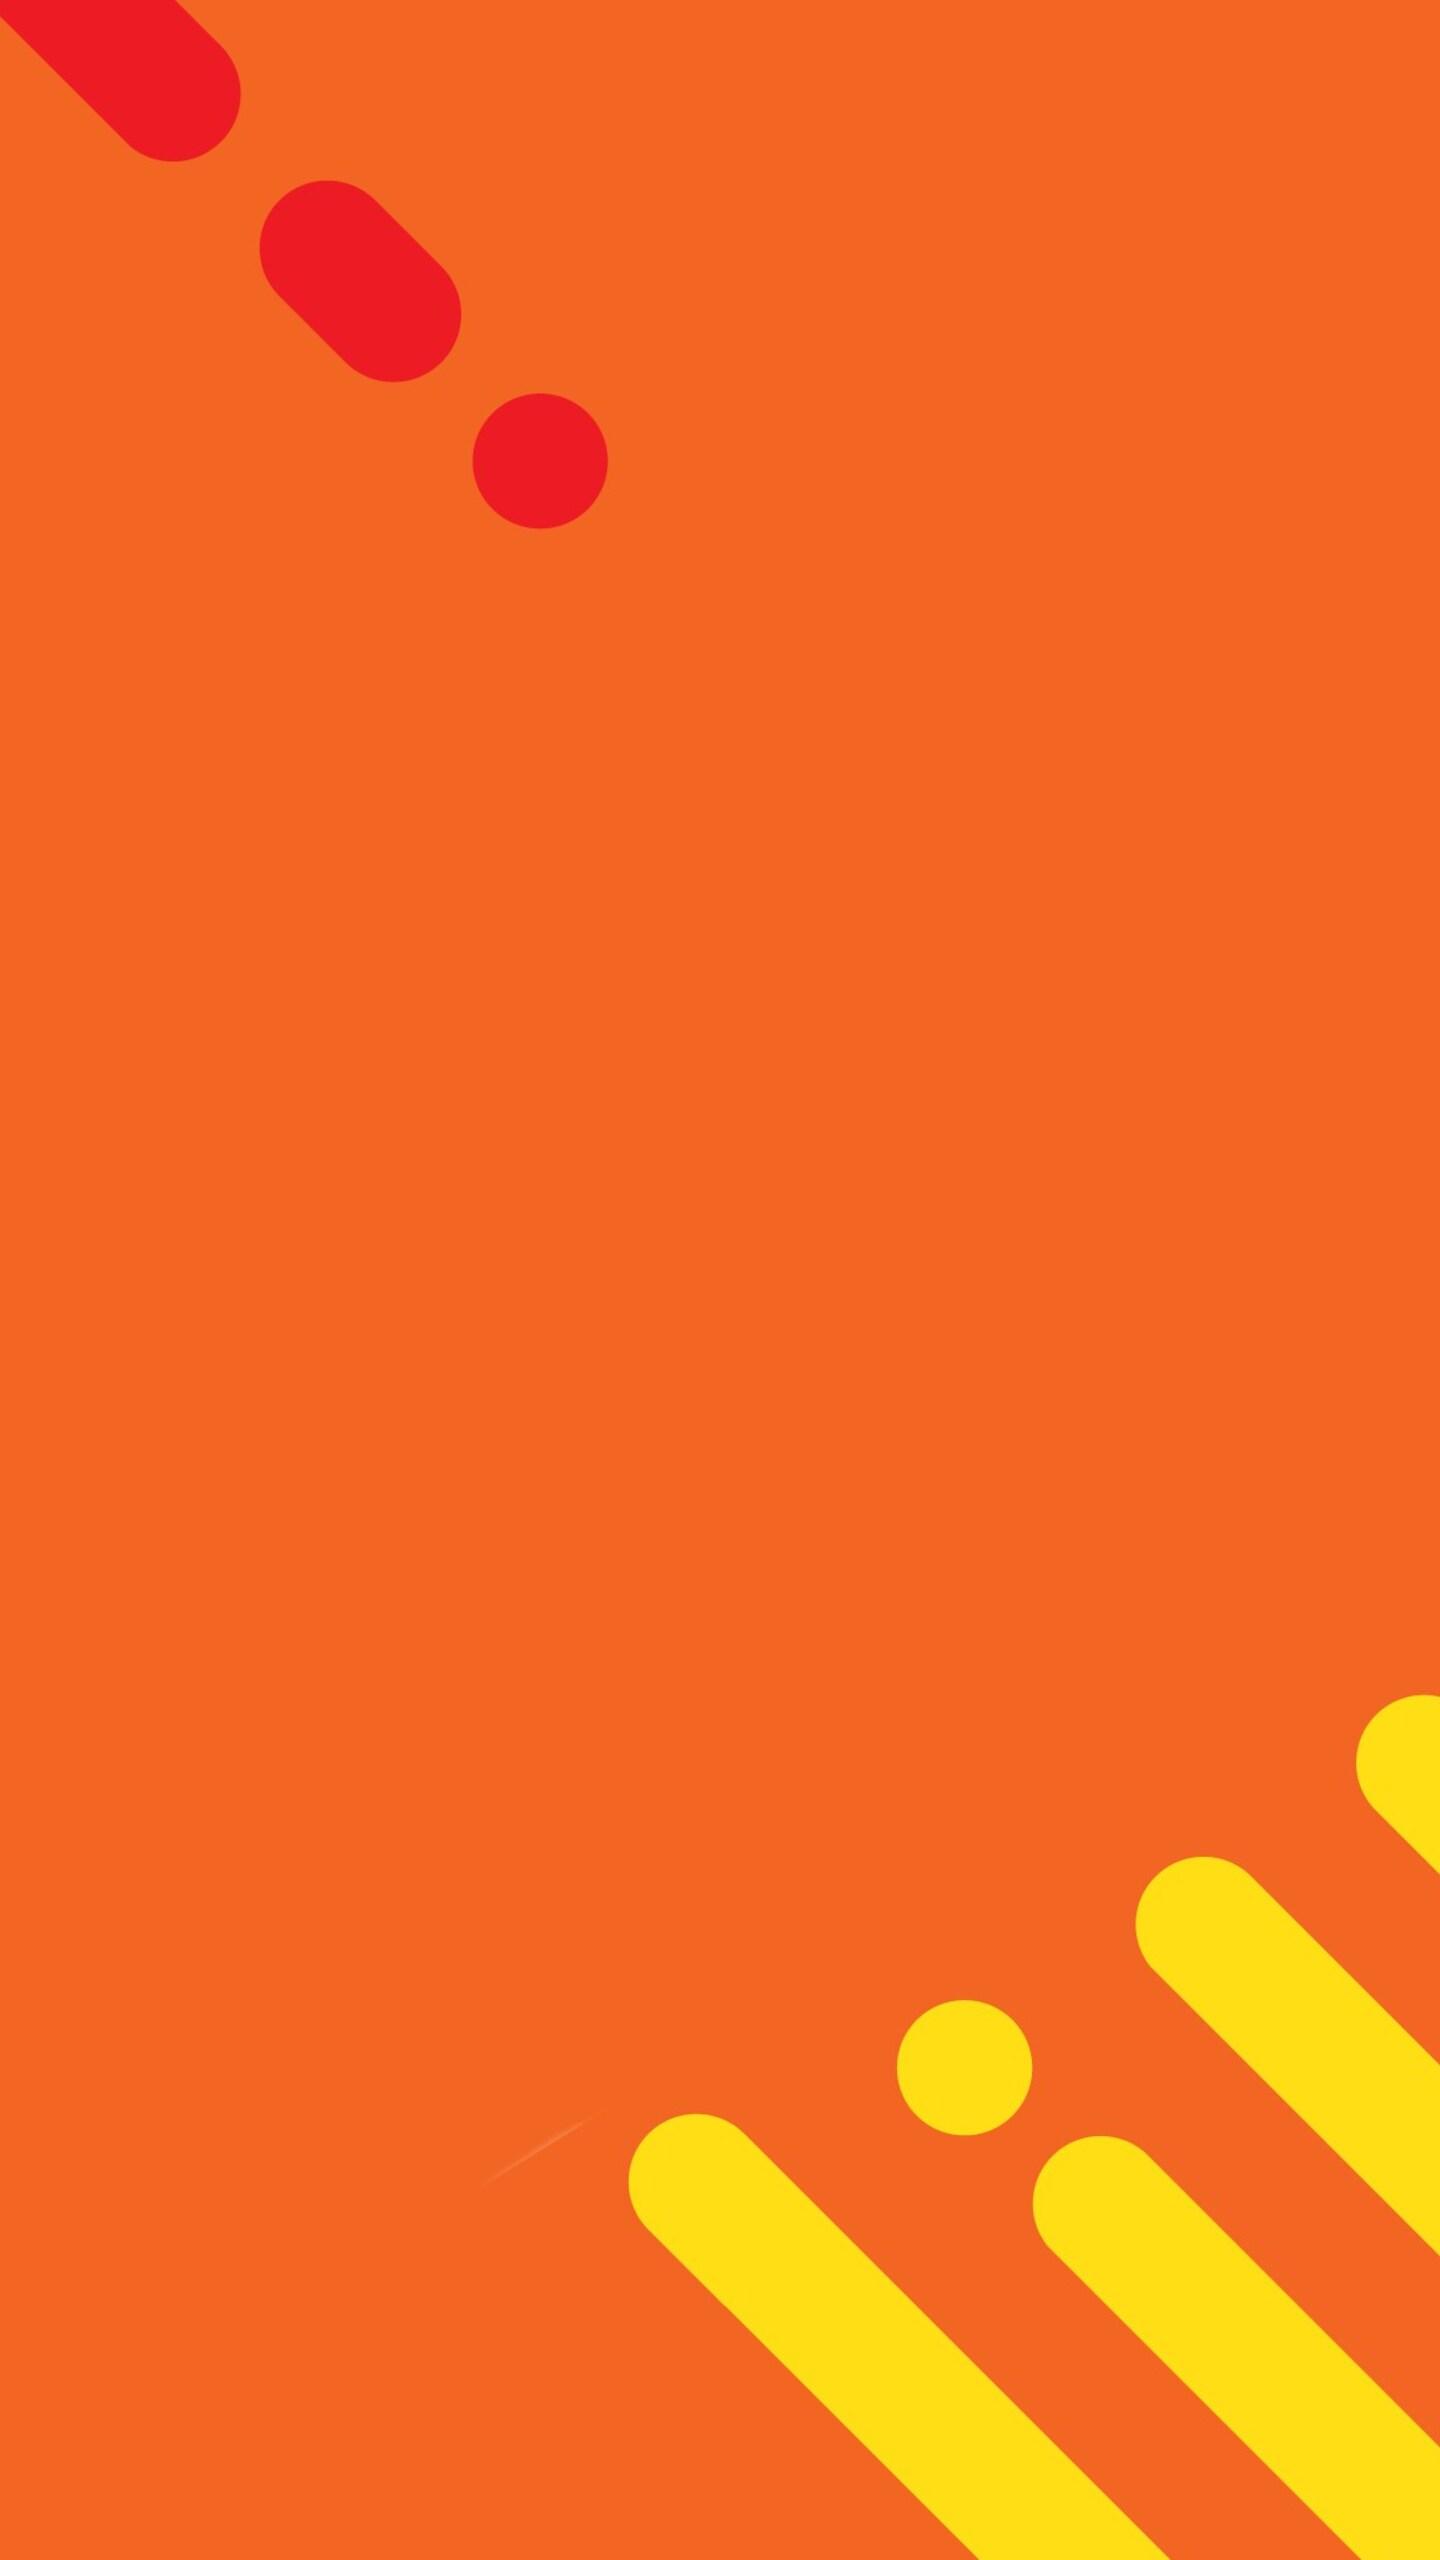 orange-minimalism.jpg